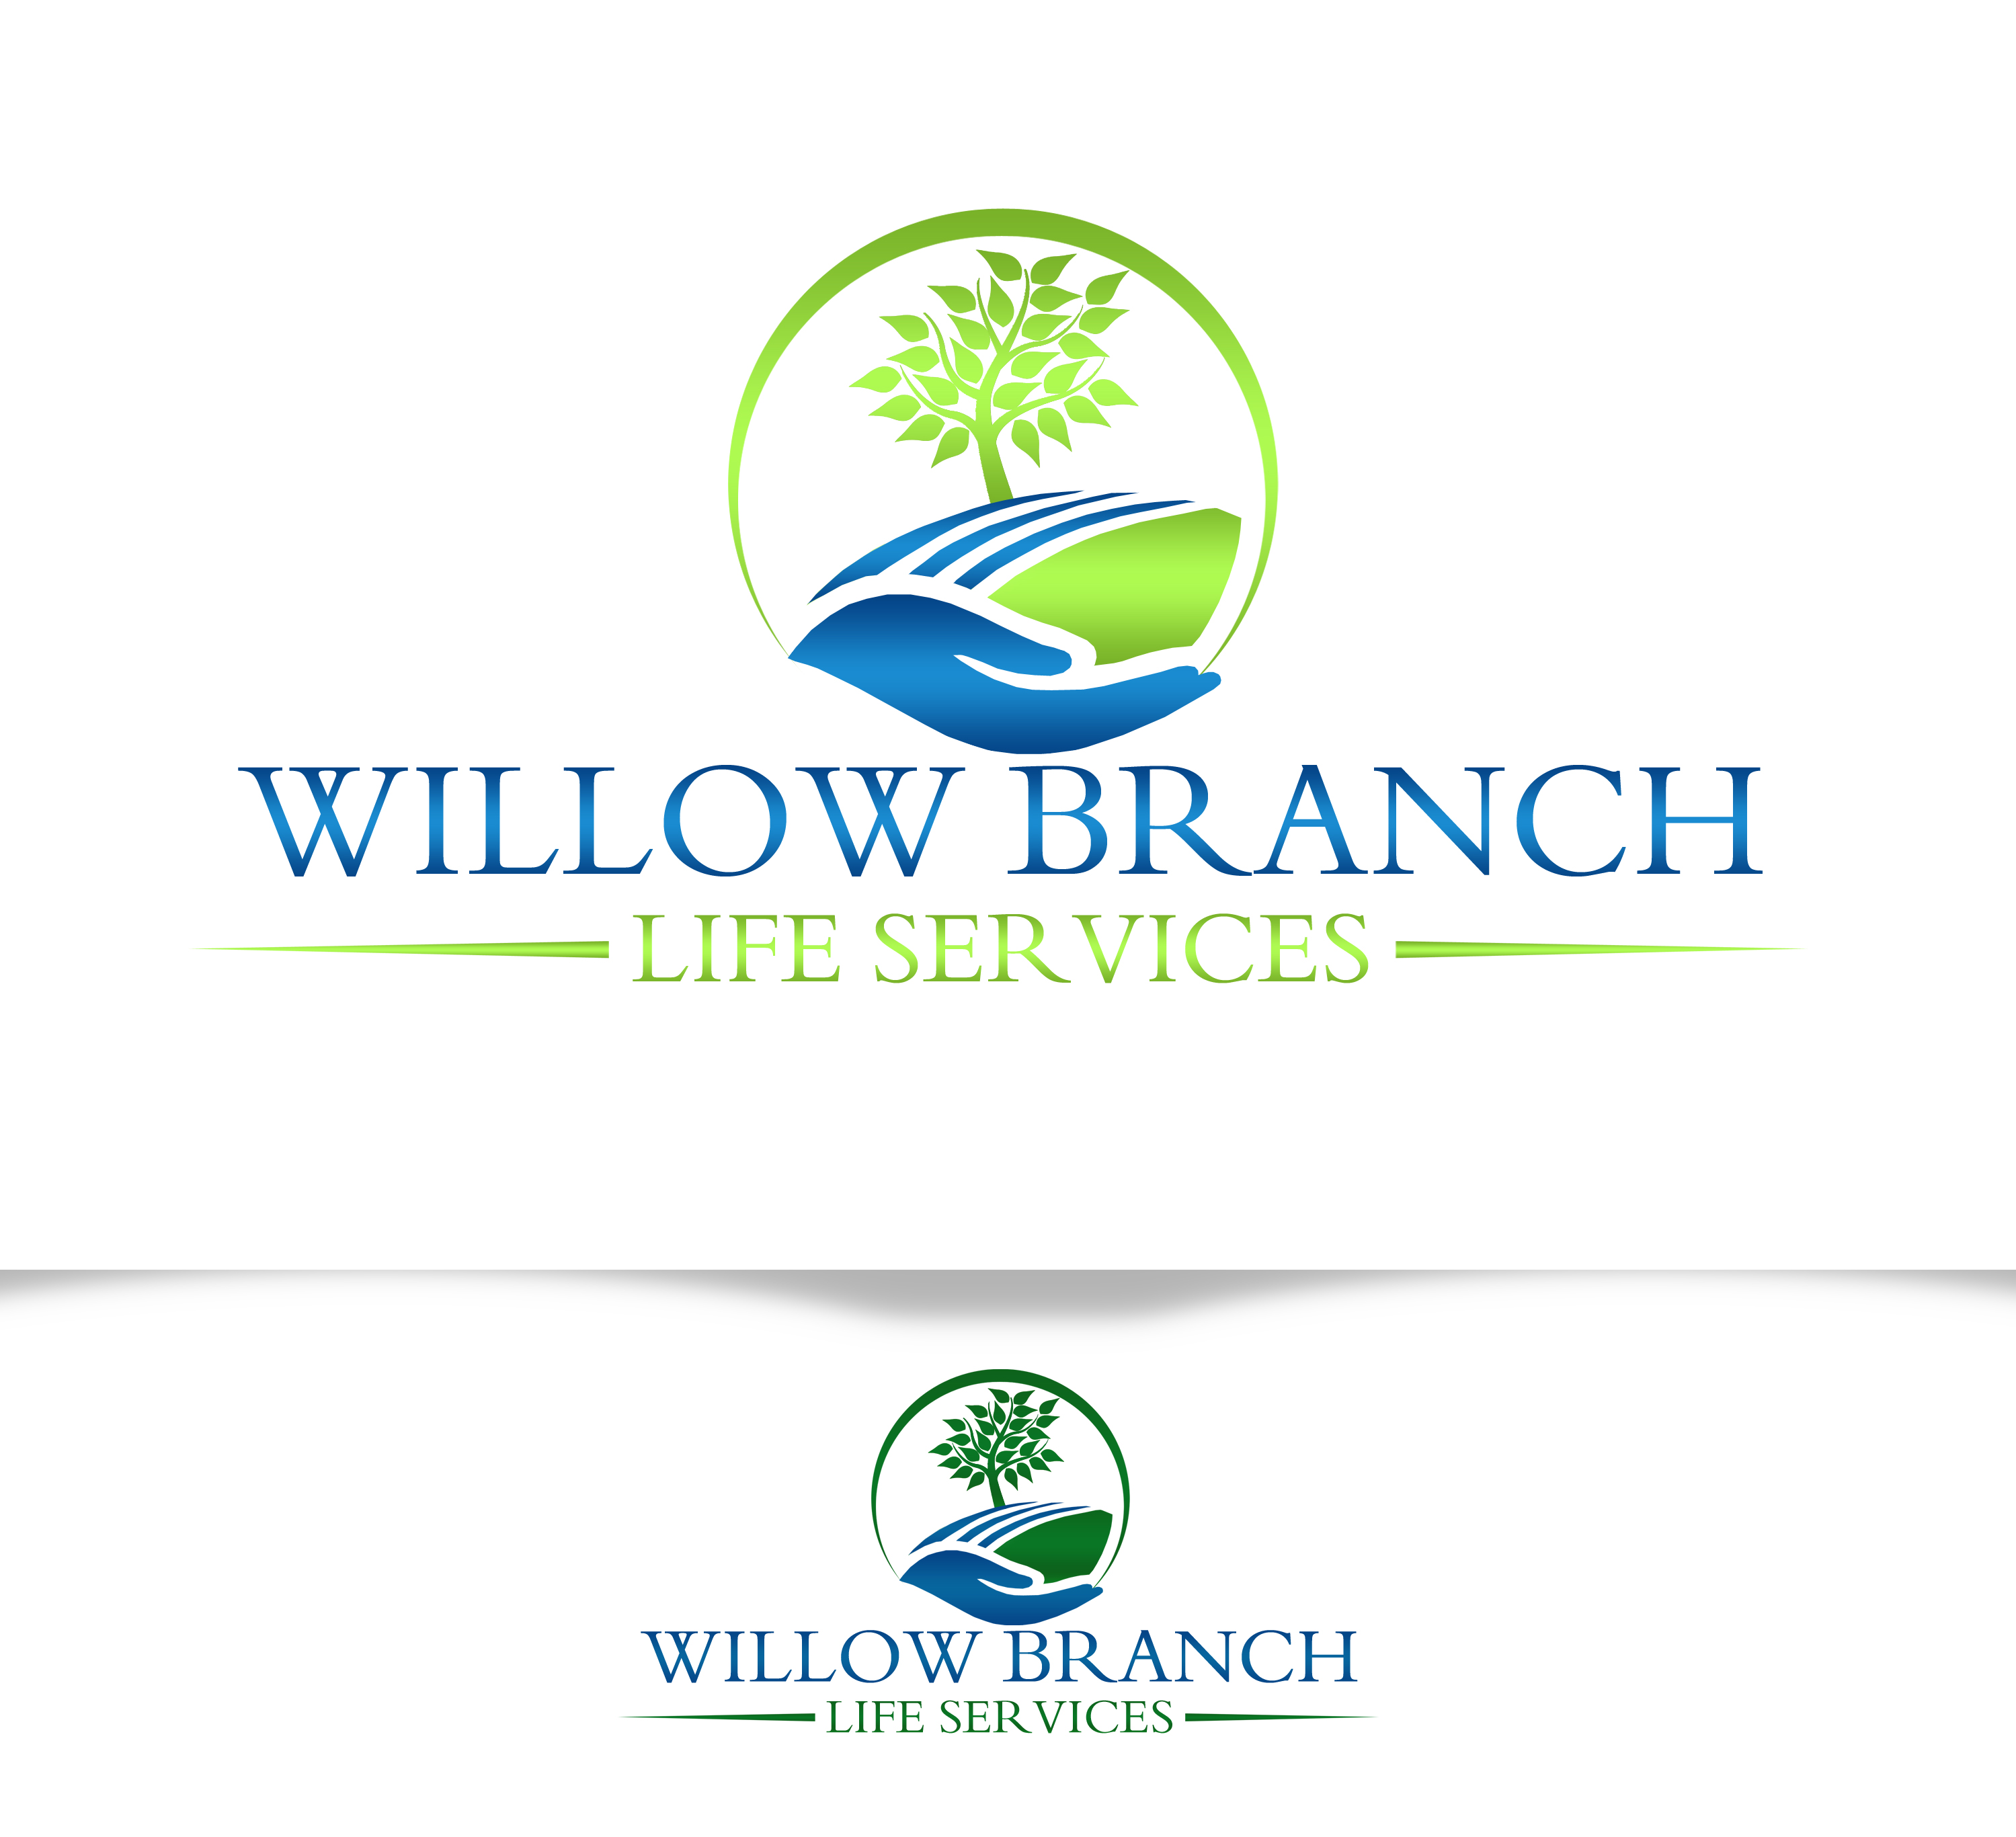 Logo Design by JSDESIGNGROUP - Entry No. 212 in the Logo Design Contest Artistic Logo Design for Willow Branch Life Service.